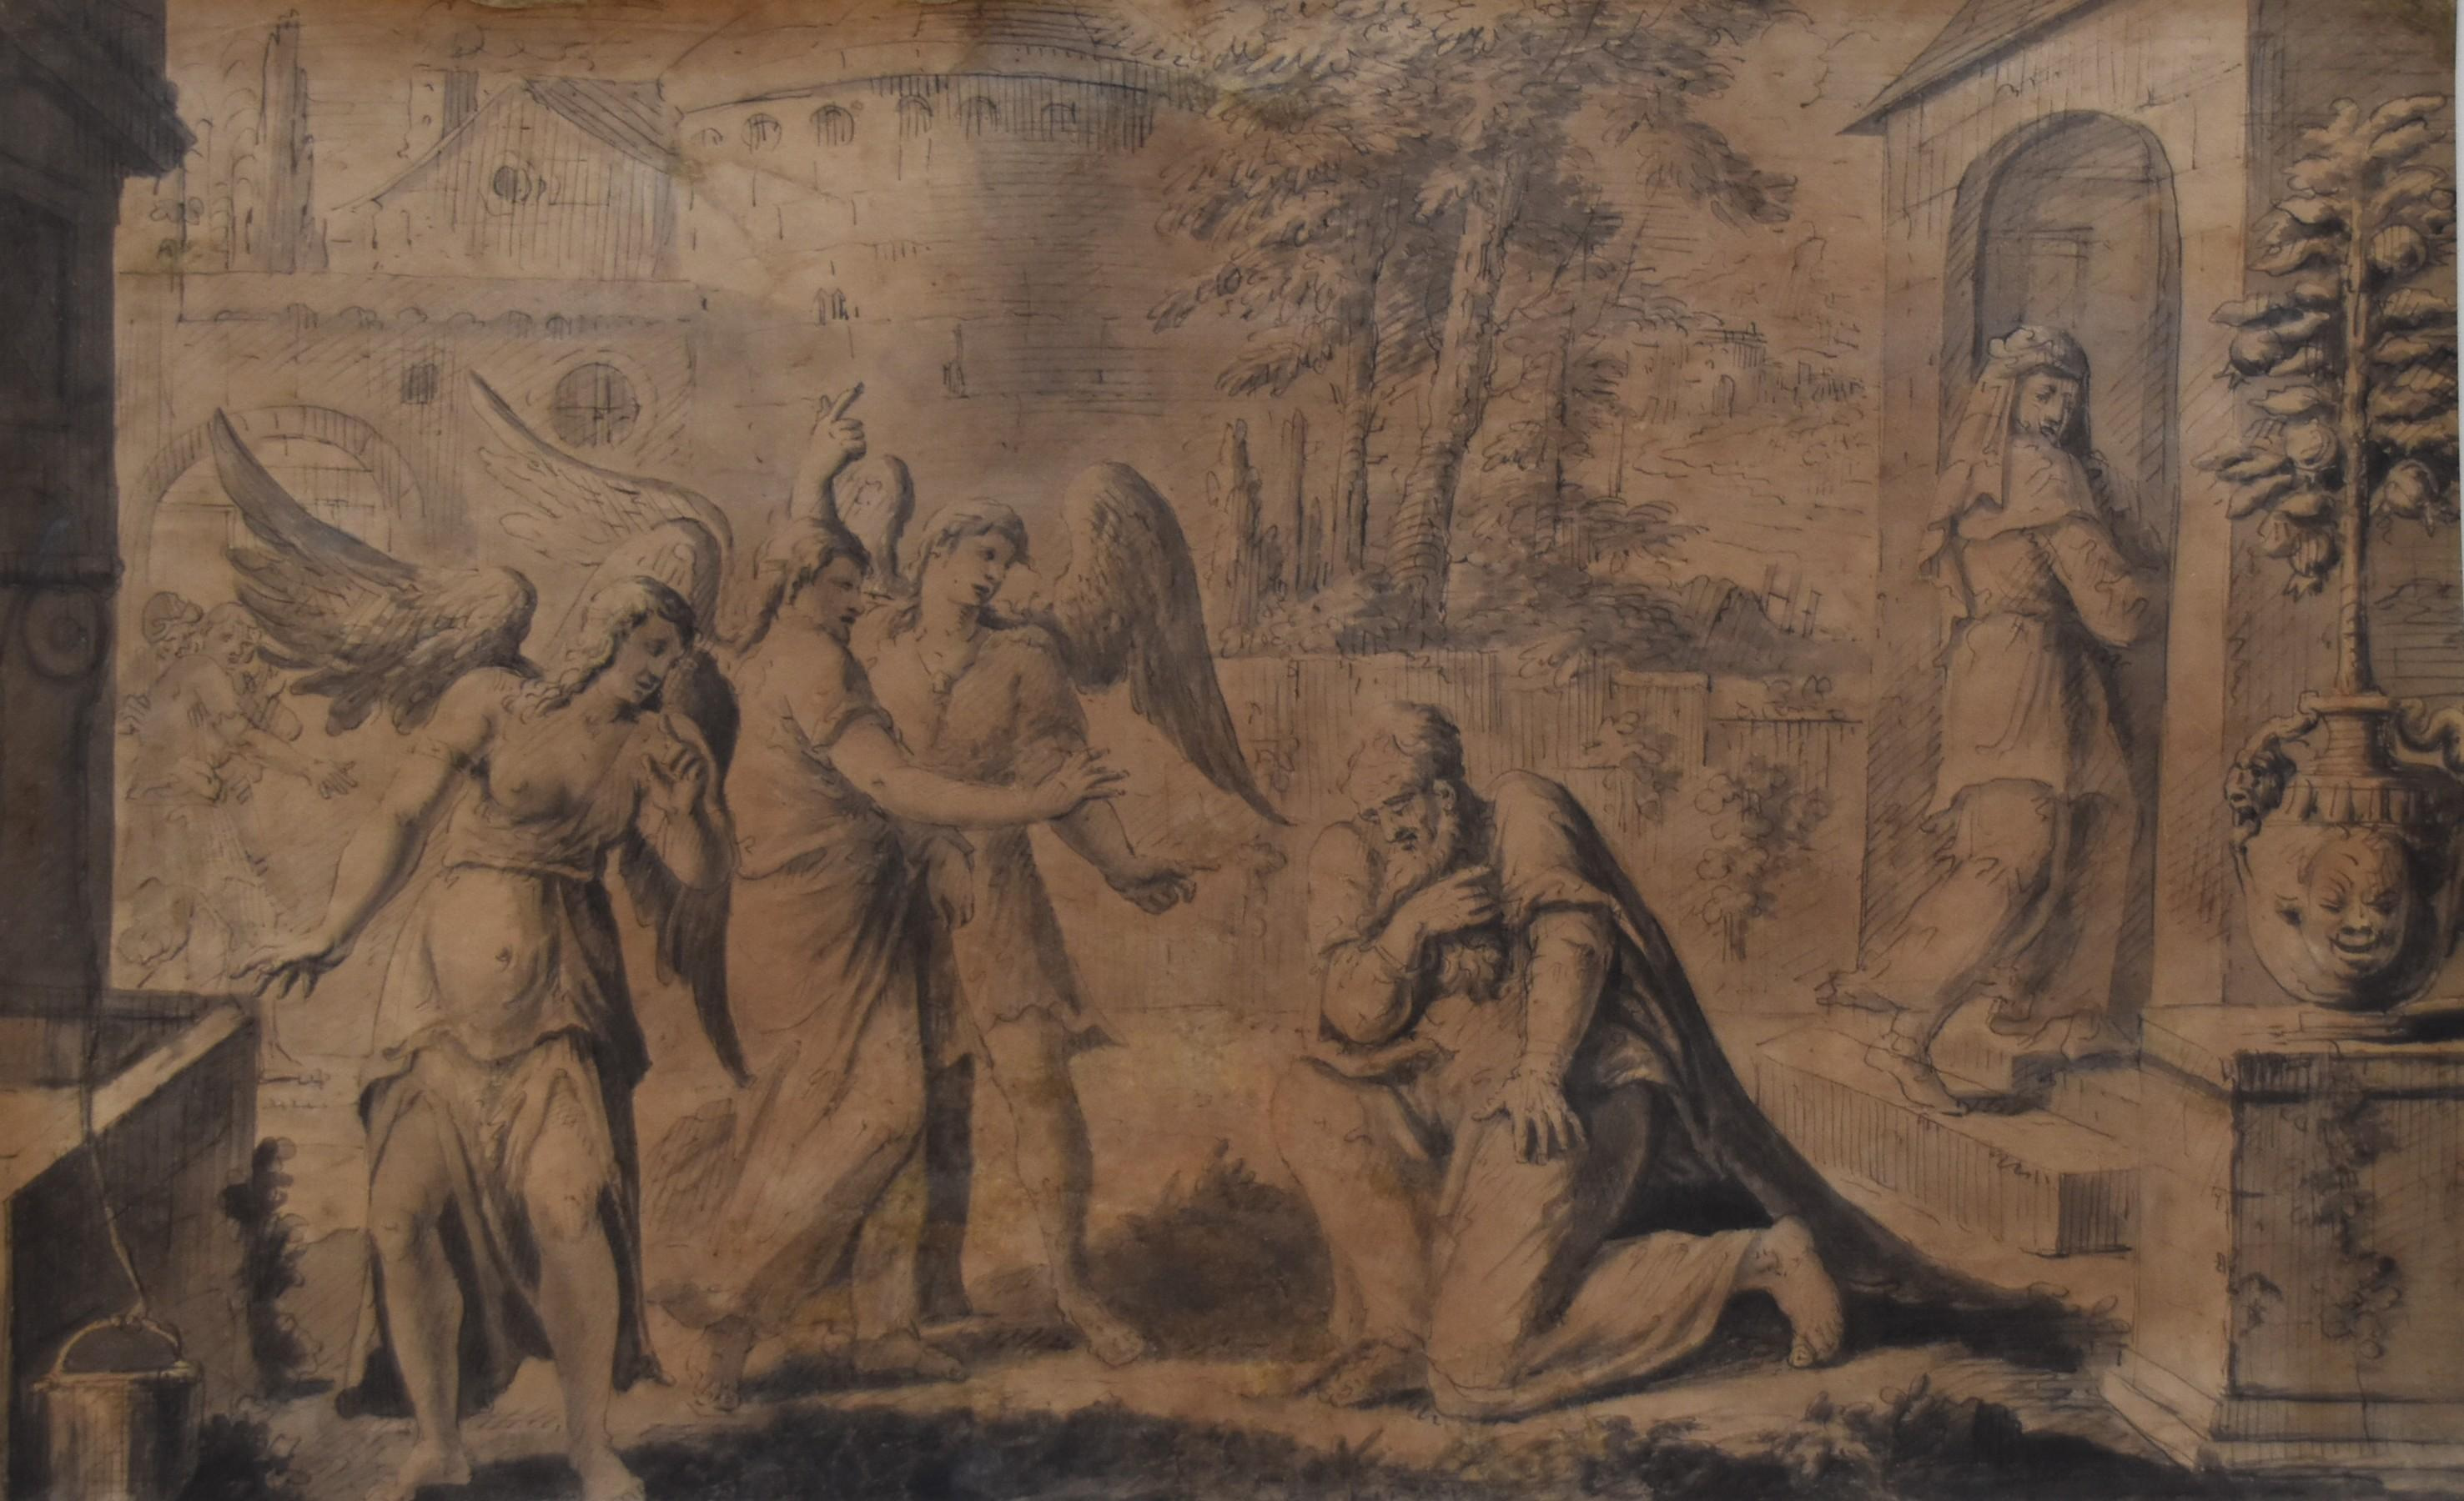 François Boitard (1670-1715) Abraham and the Three Angels, original drawing